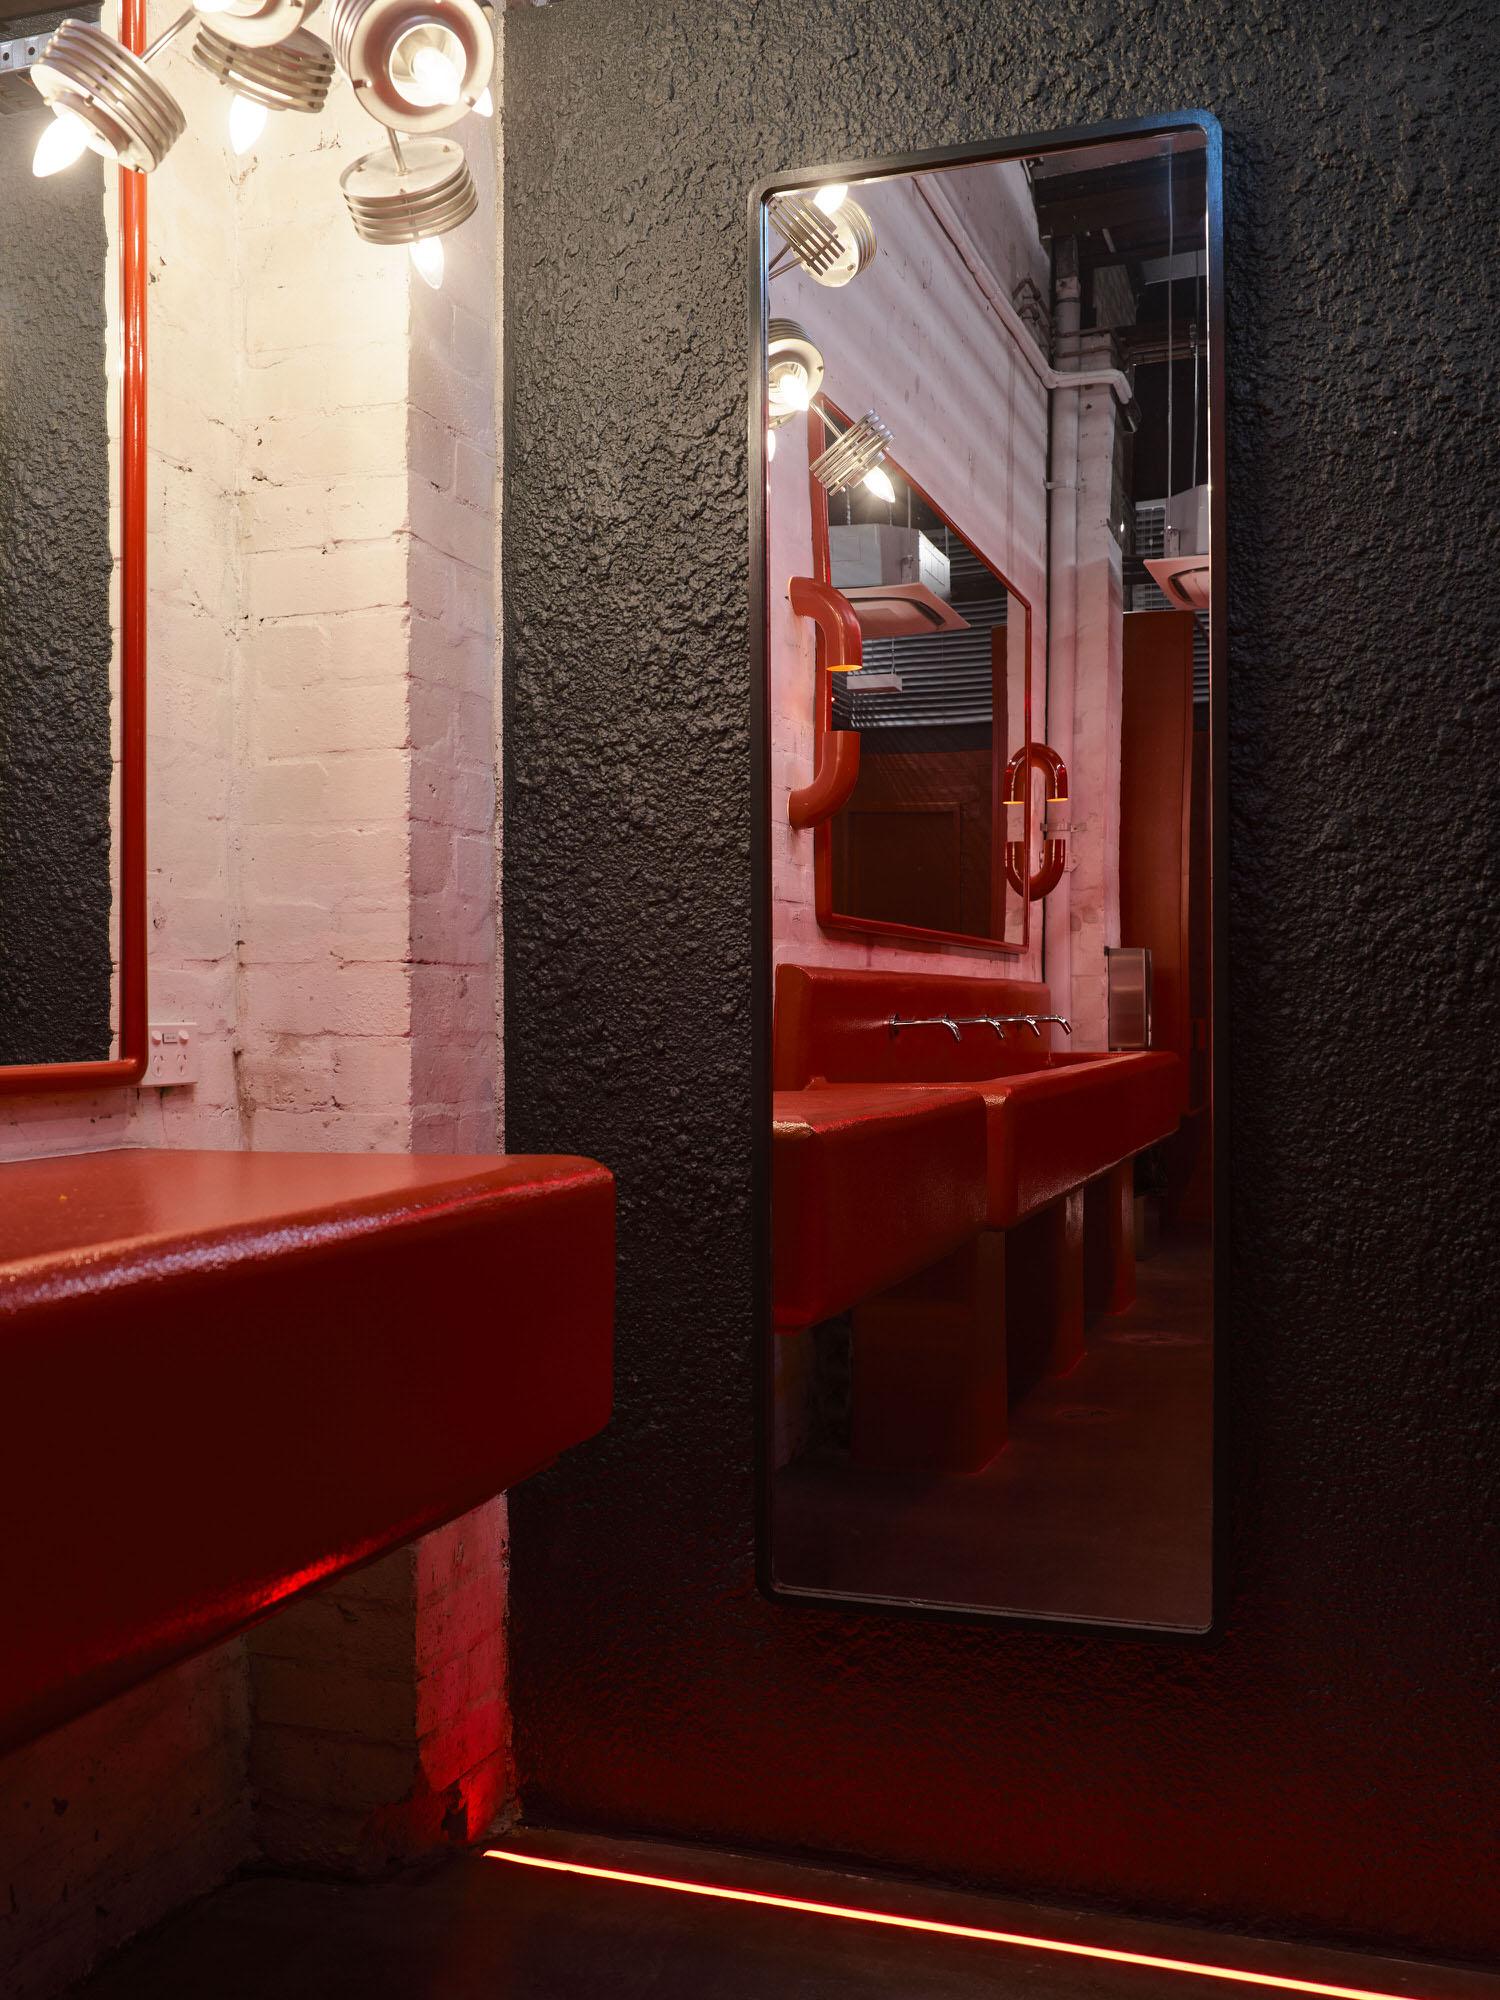 Atomic Beer Project Redfern Ysg Studio Photo Anson Smart Yellowtrace 24